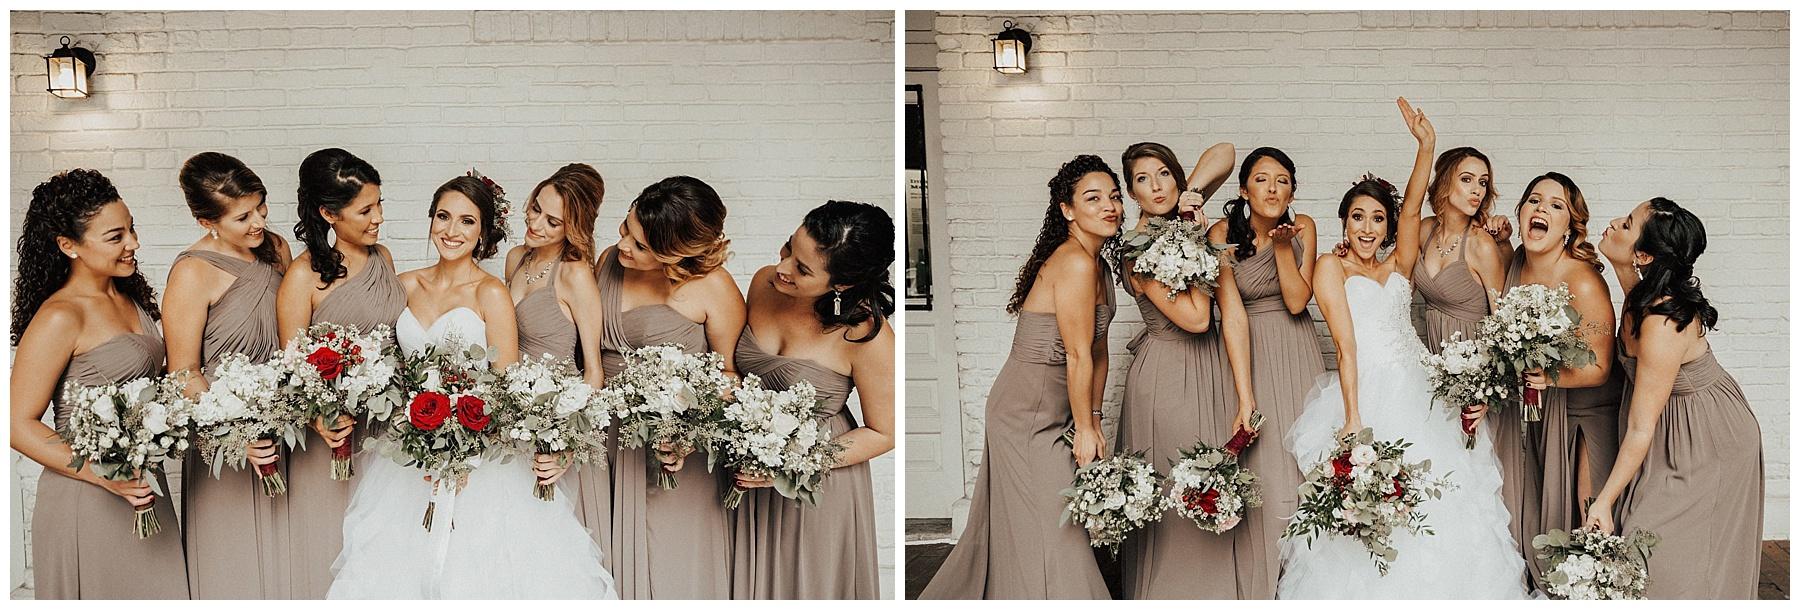 YBOR Wedding Tampa Wedding Photographer-85.jpg